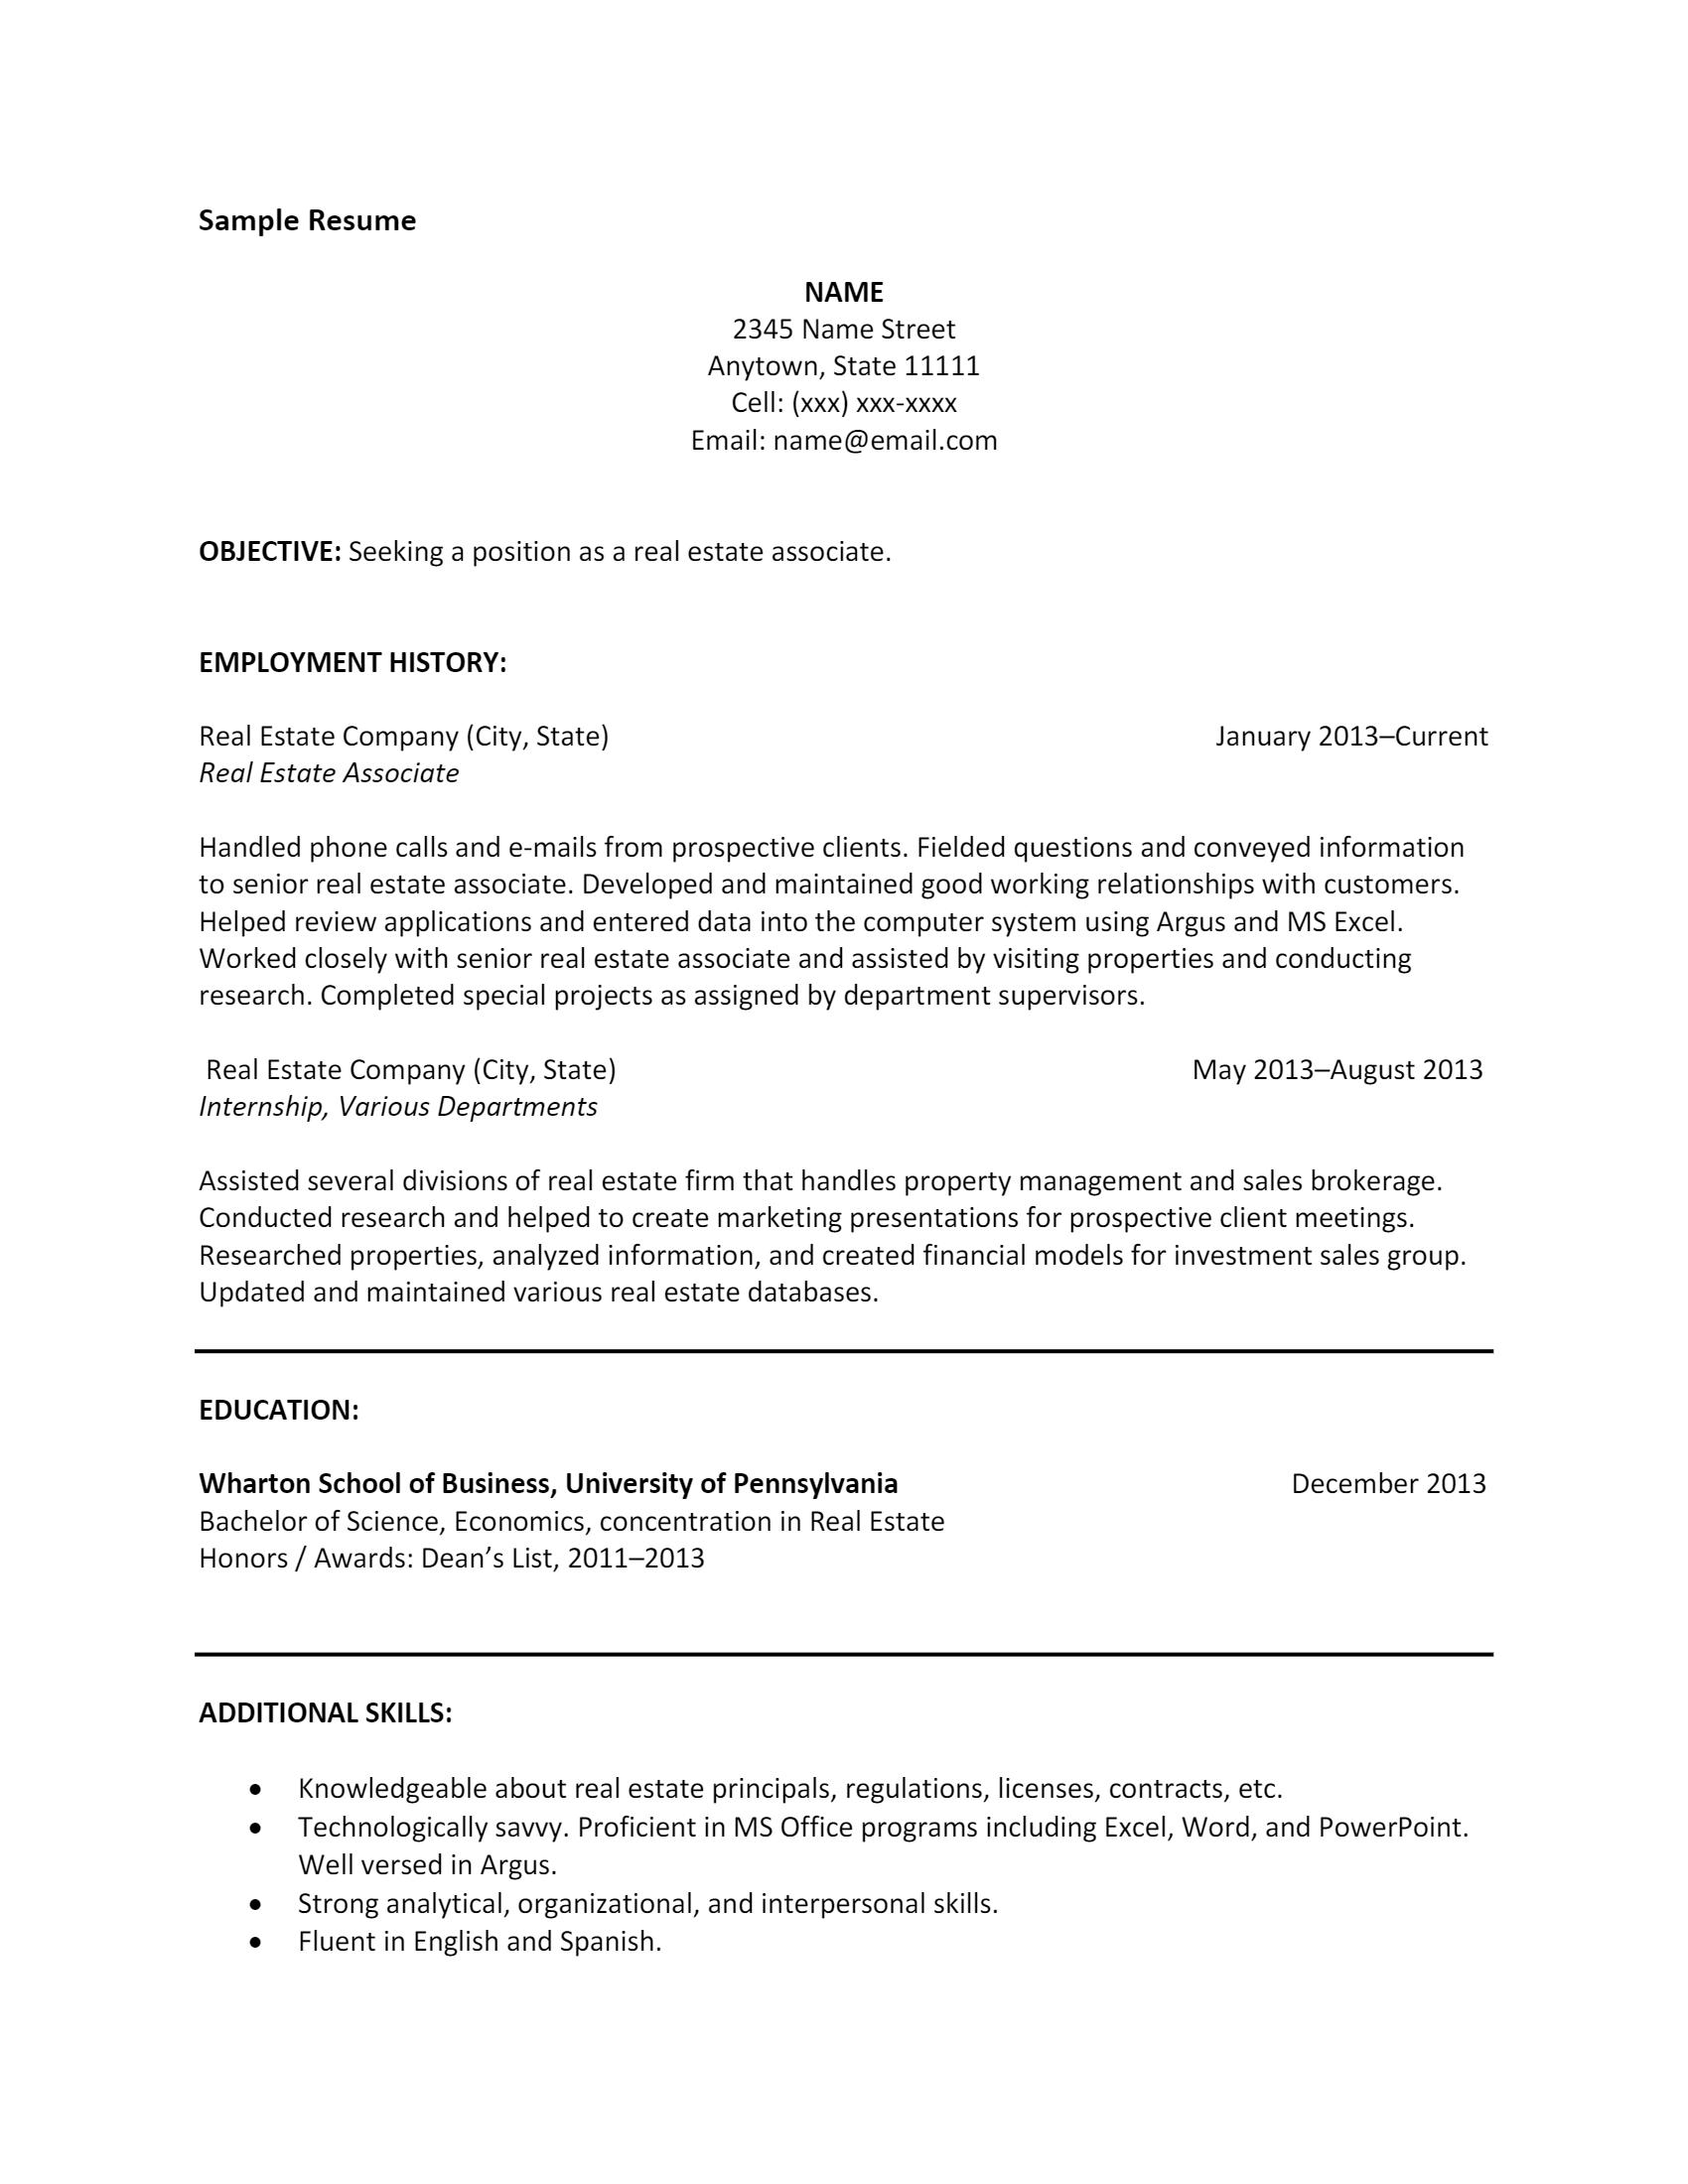 Real Estate Resume > Real Estate Resume .Docx (Word)